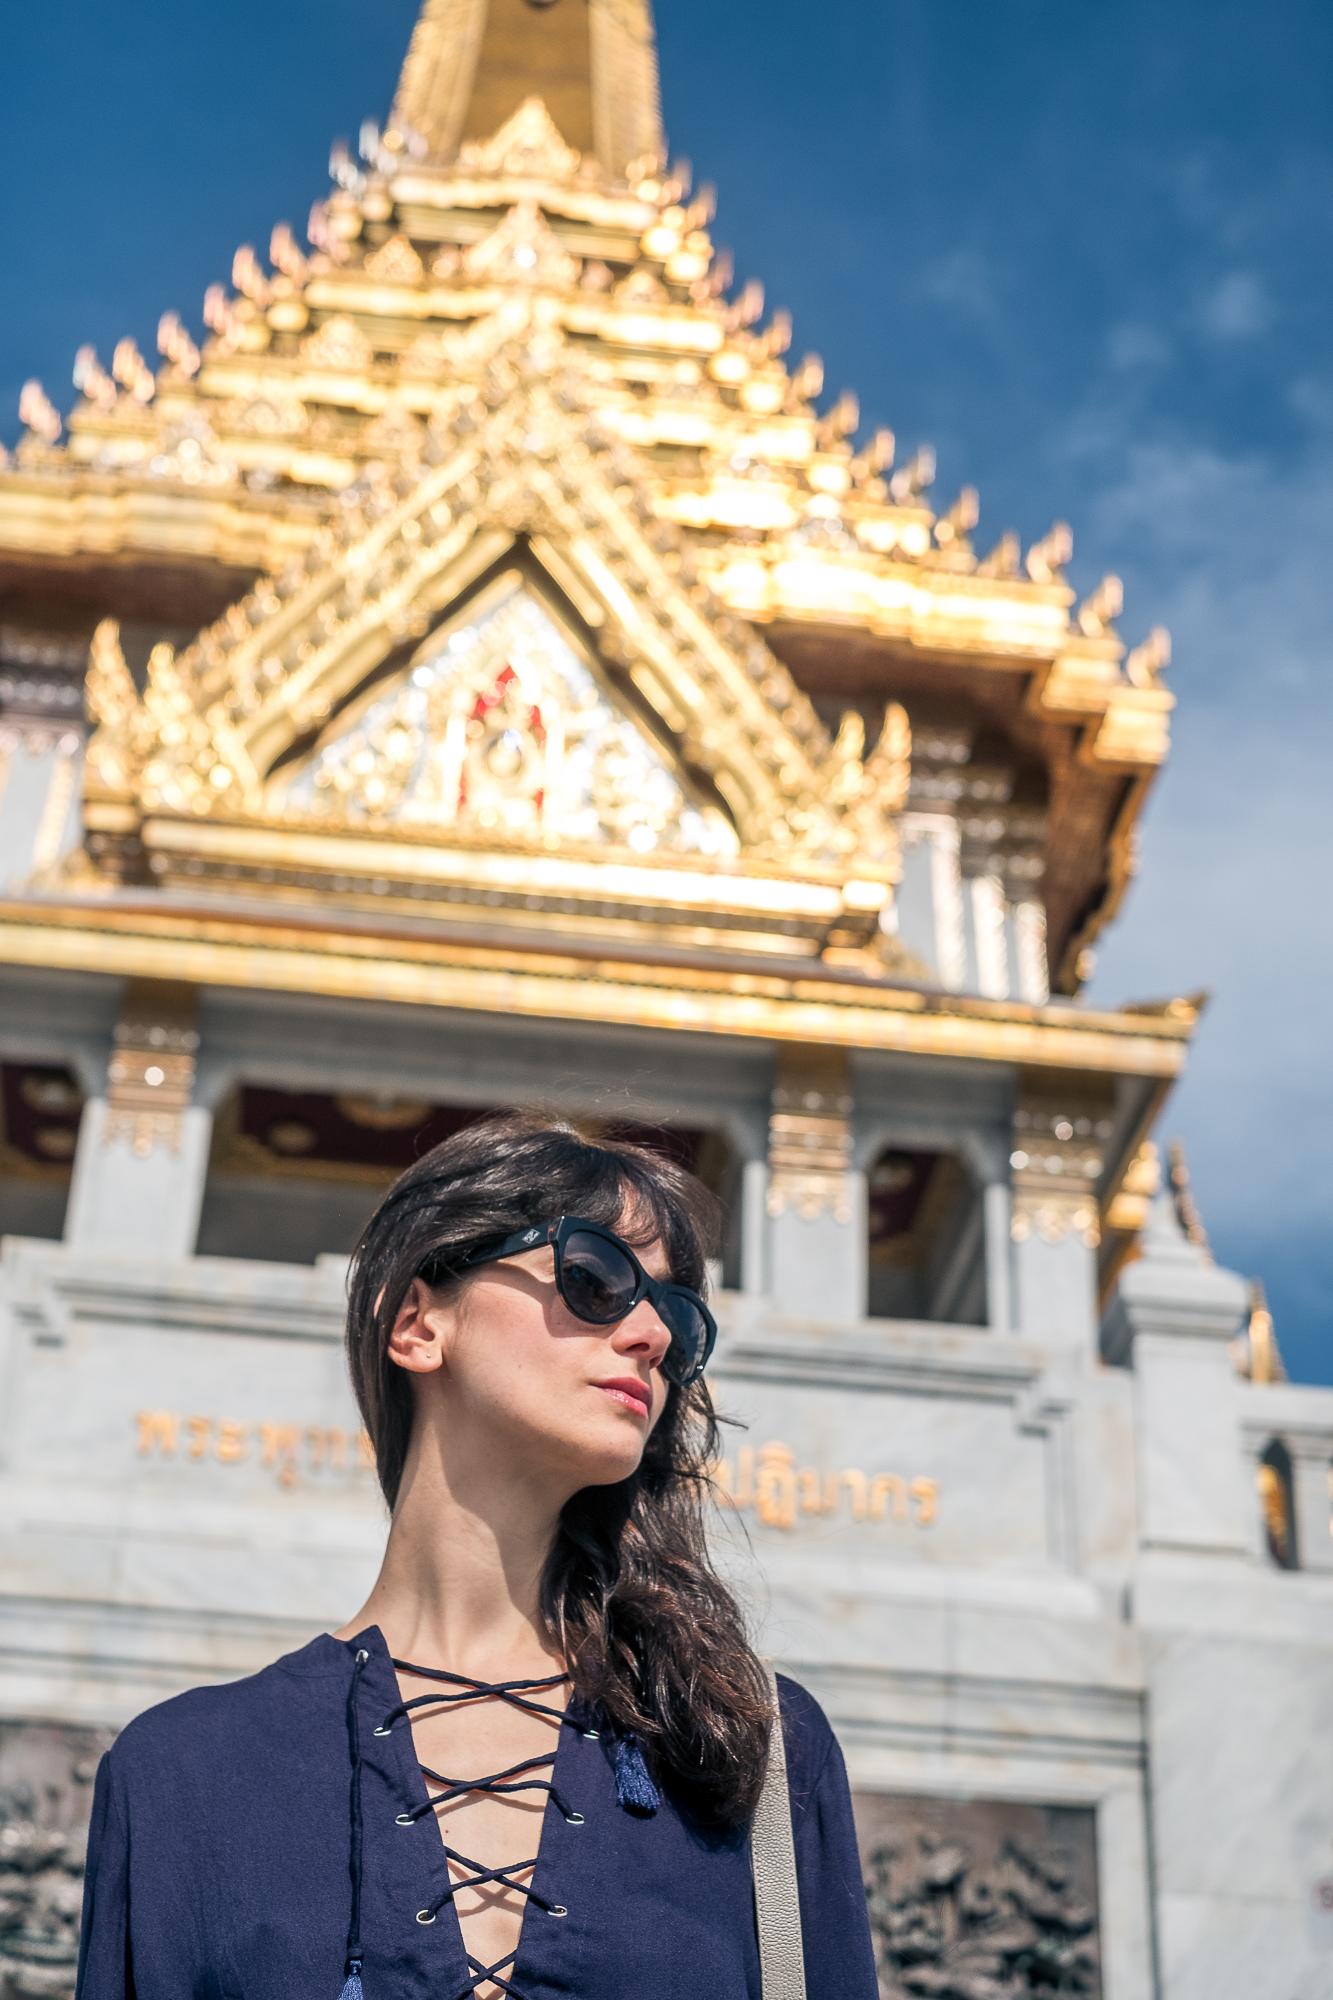 THAILAND_Honeymoon_TheOutsiderBlog_DSCF0093.JPG